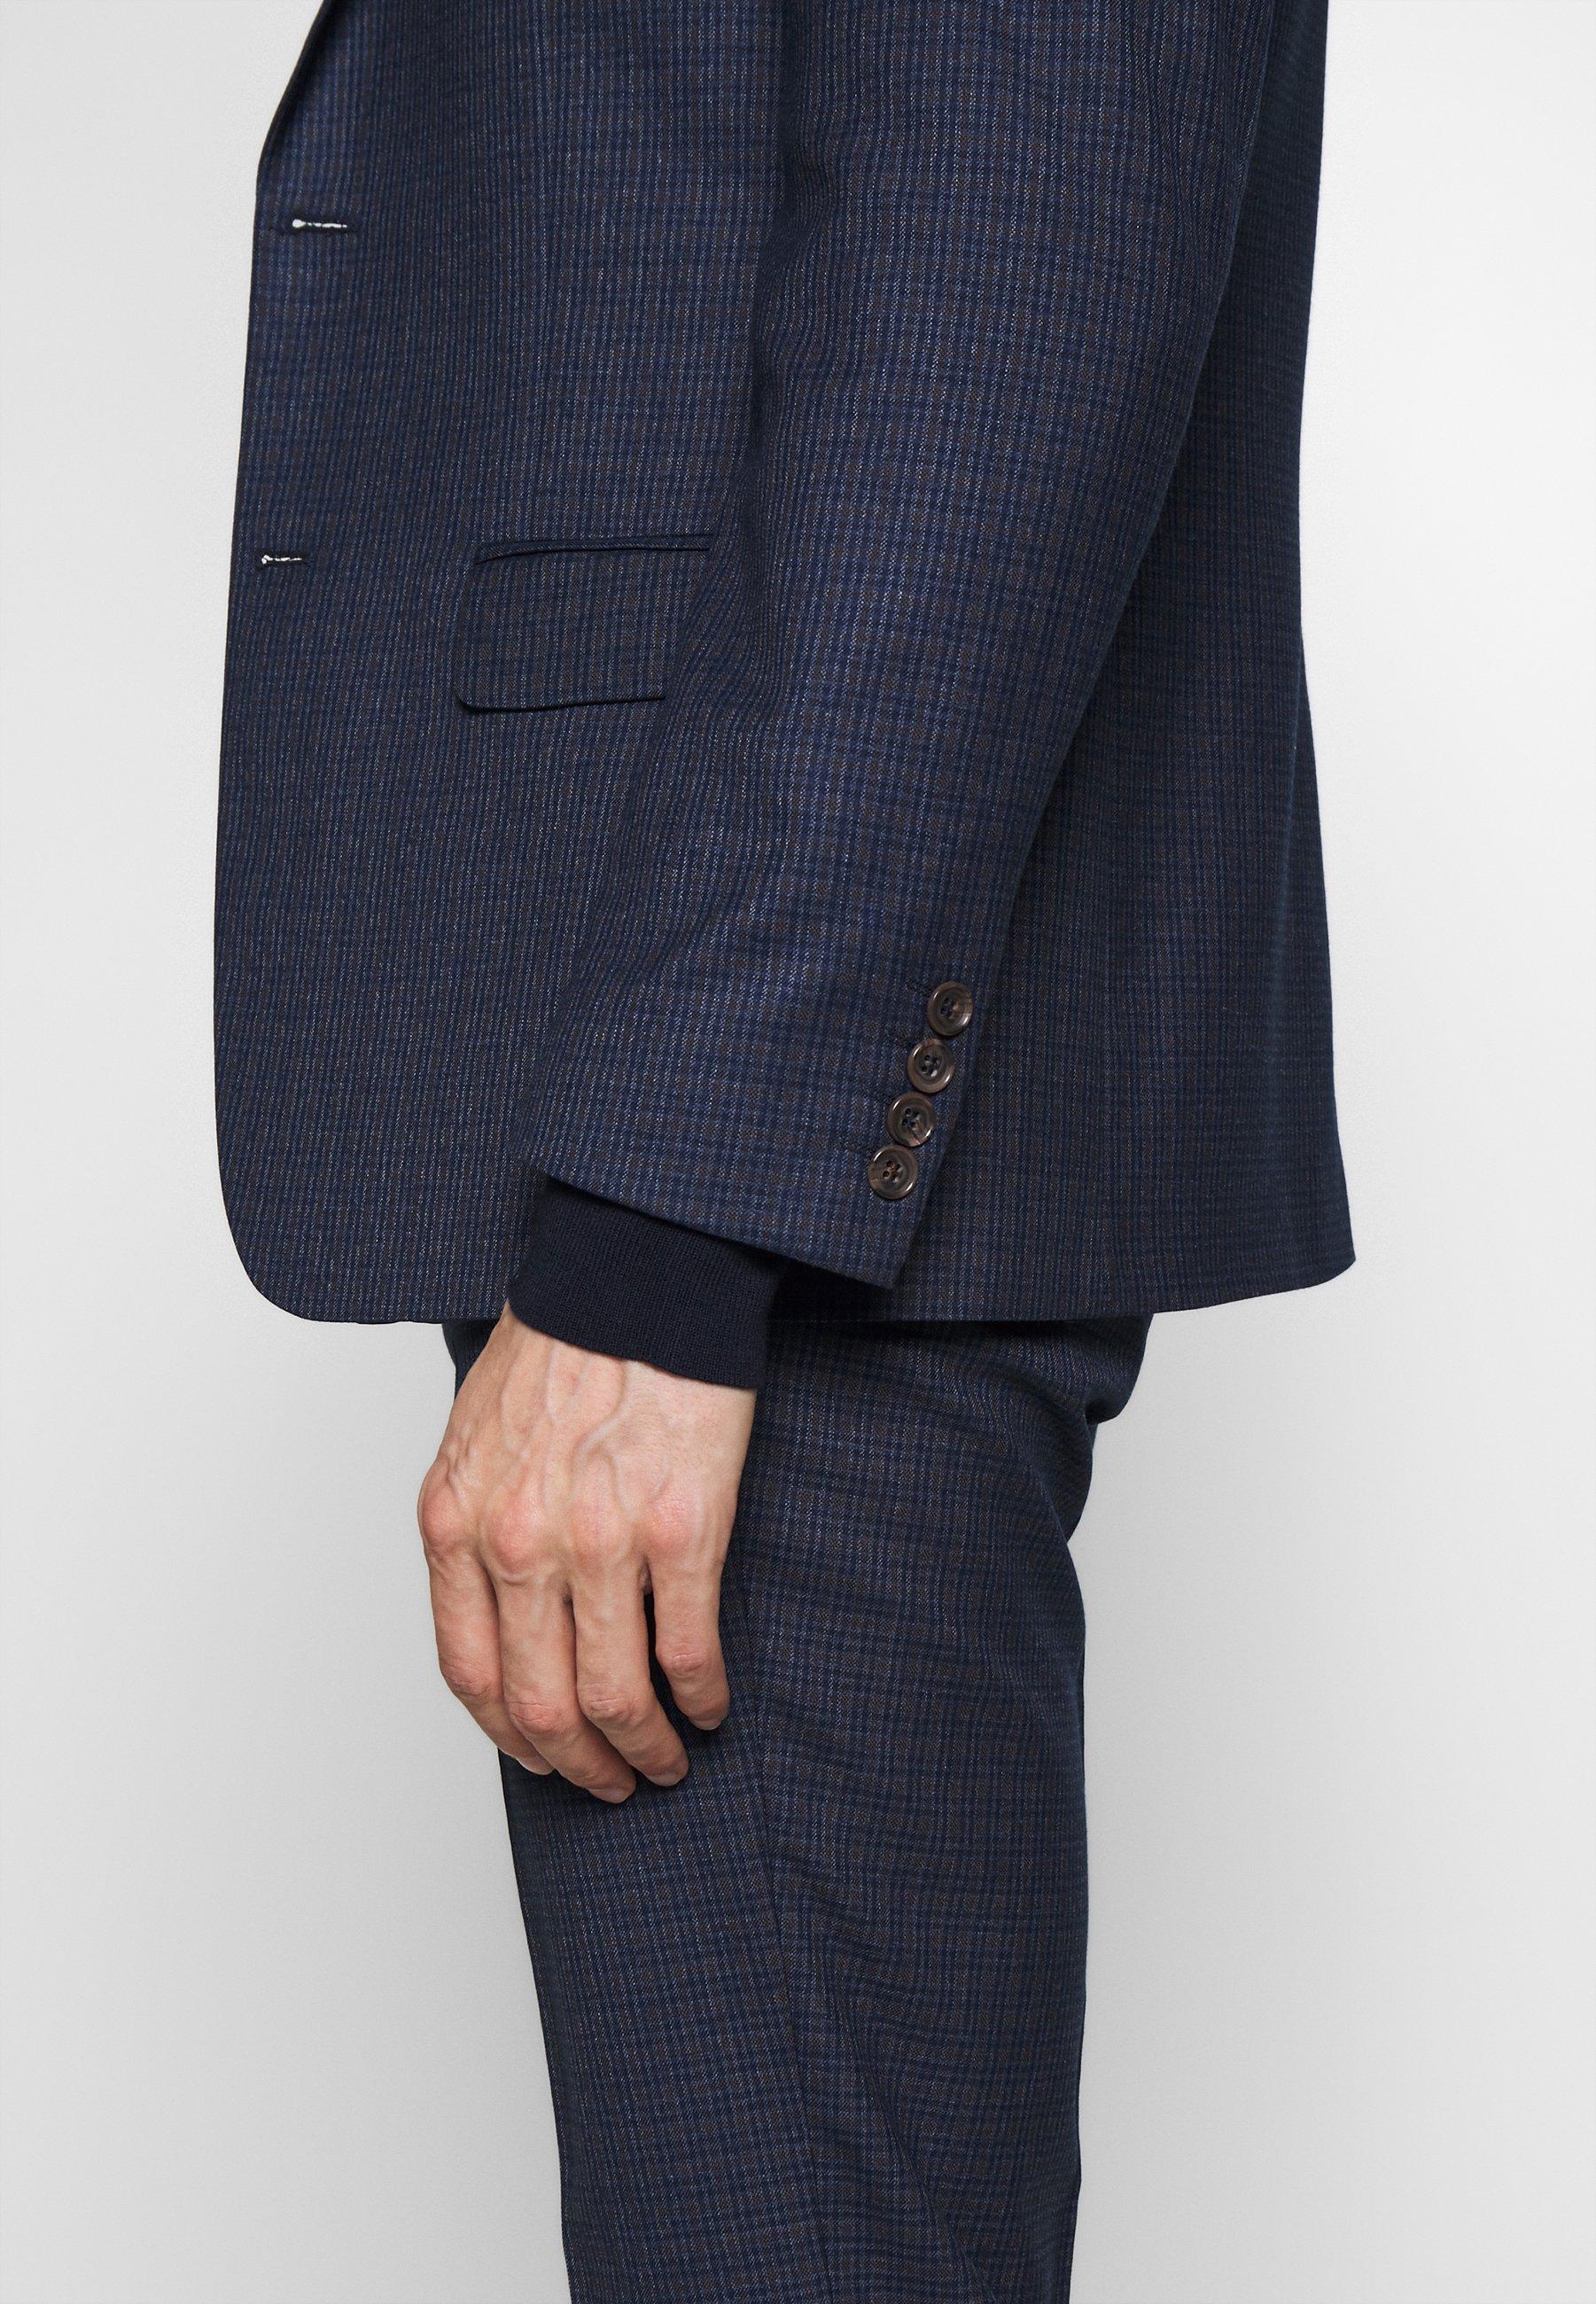 Limehaus Mini Check Suit - Costume Navy